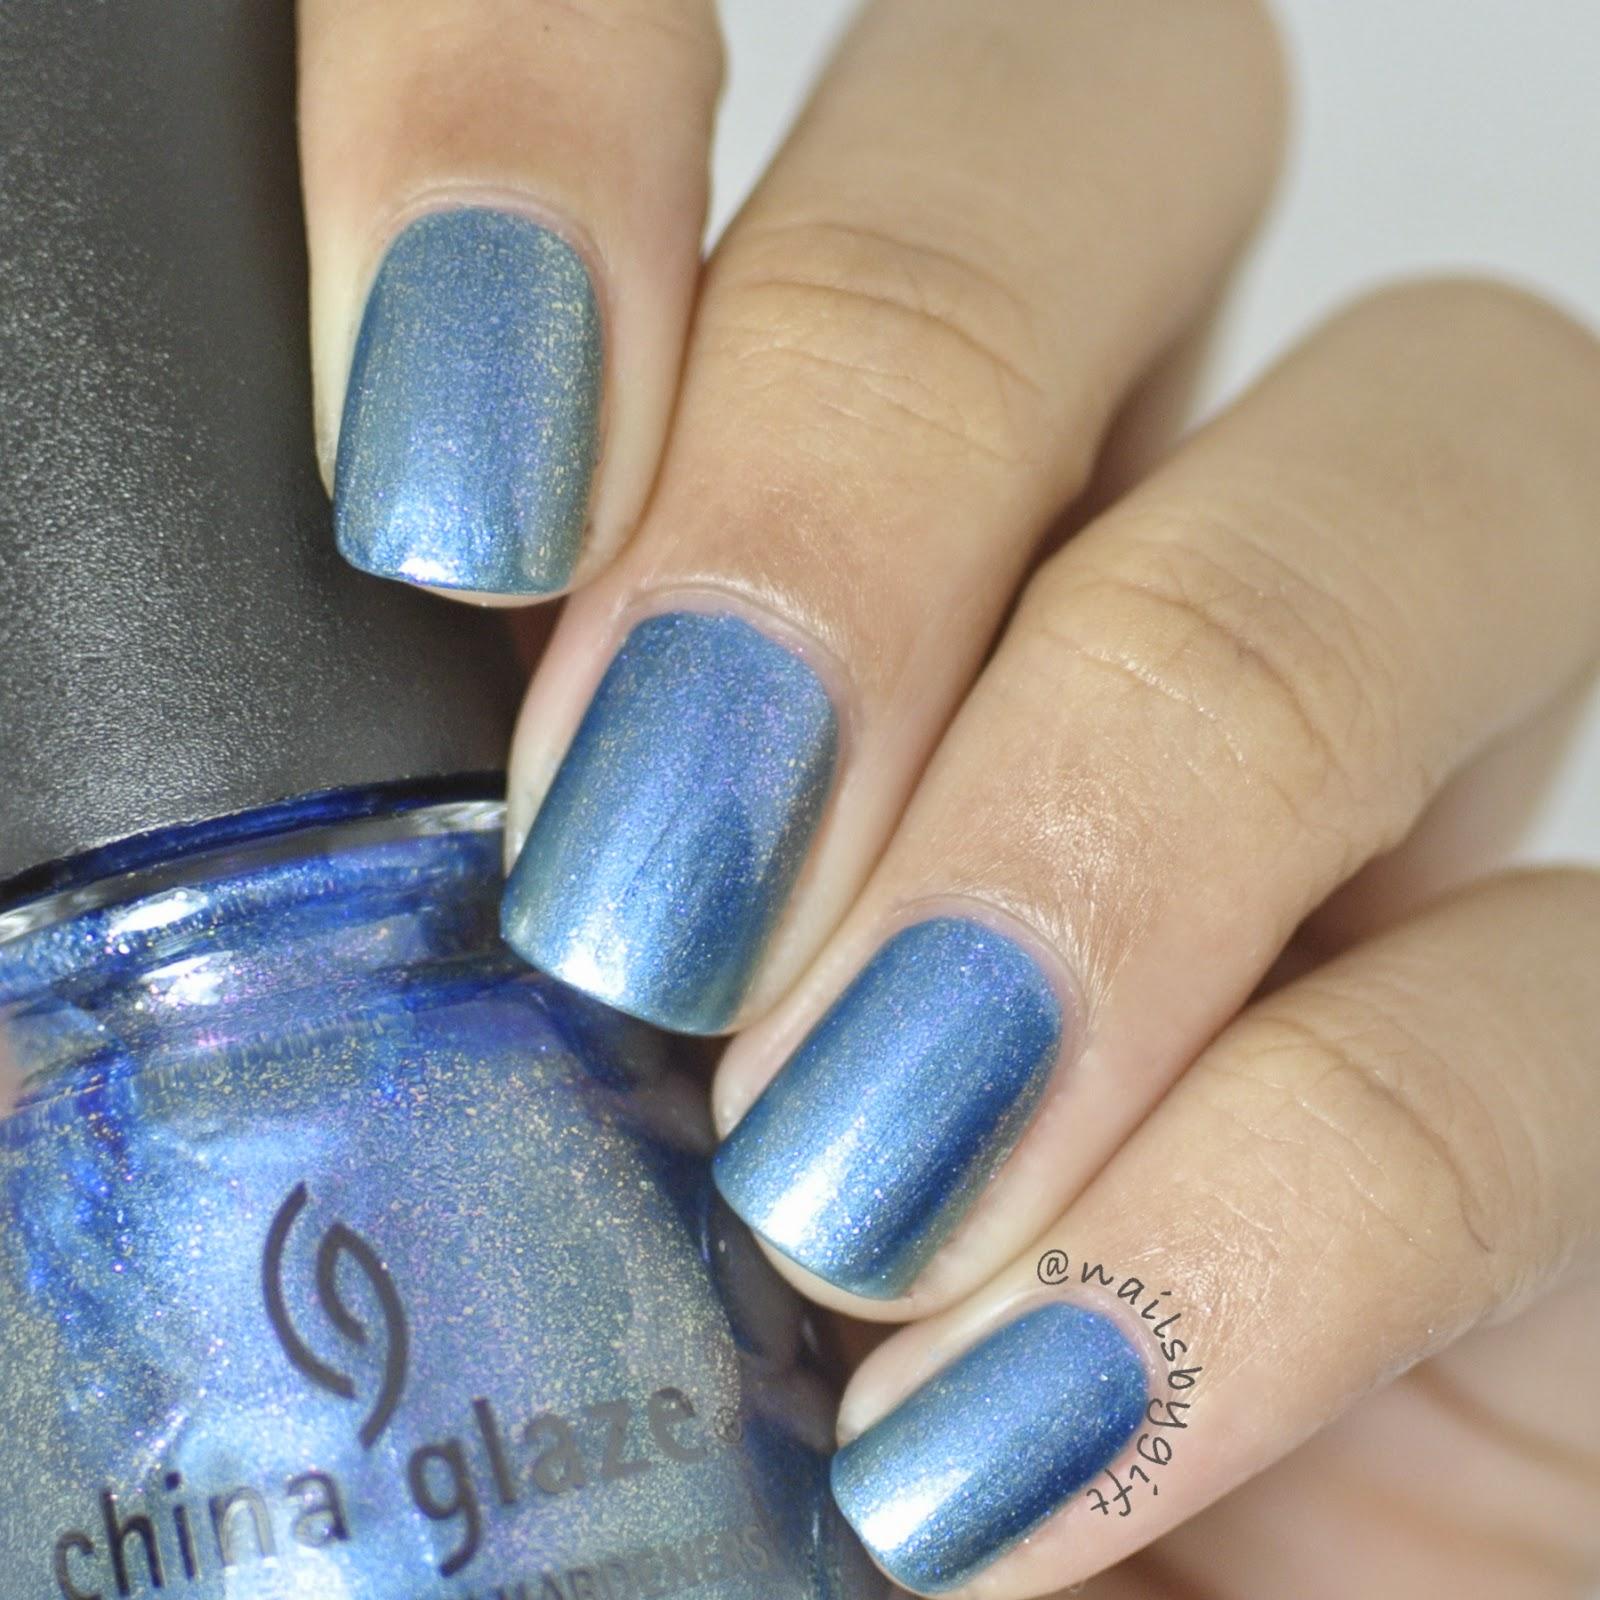 Communication on this topic: China Glaze Twinkle Holiday 2014 Nail Polish , china-glaze-twinkle-holiday-2014-nail-polish/